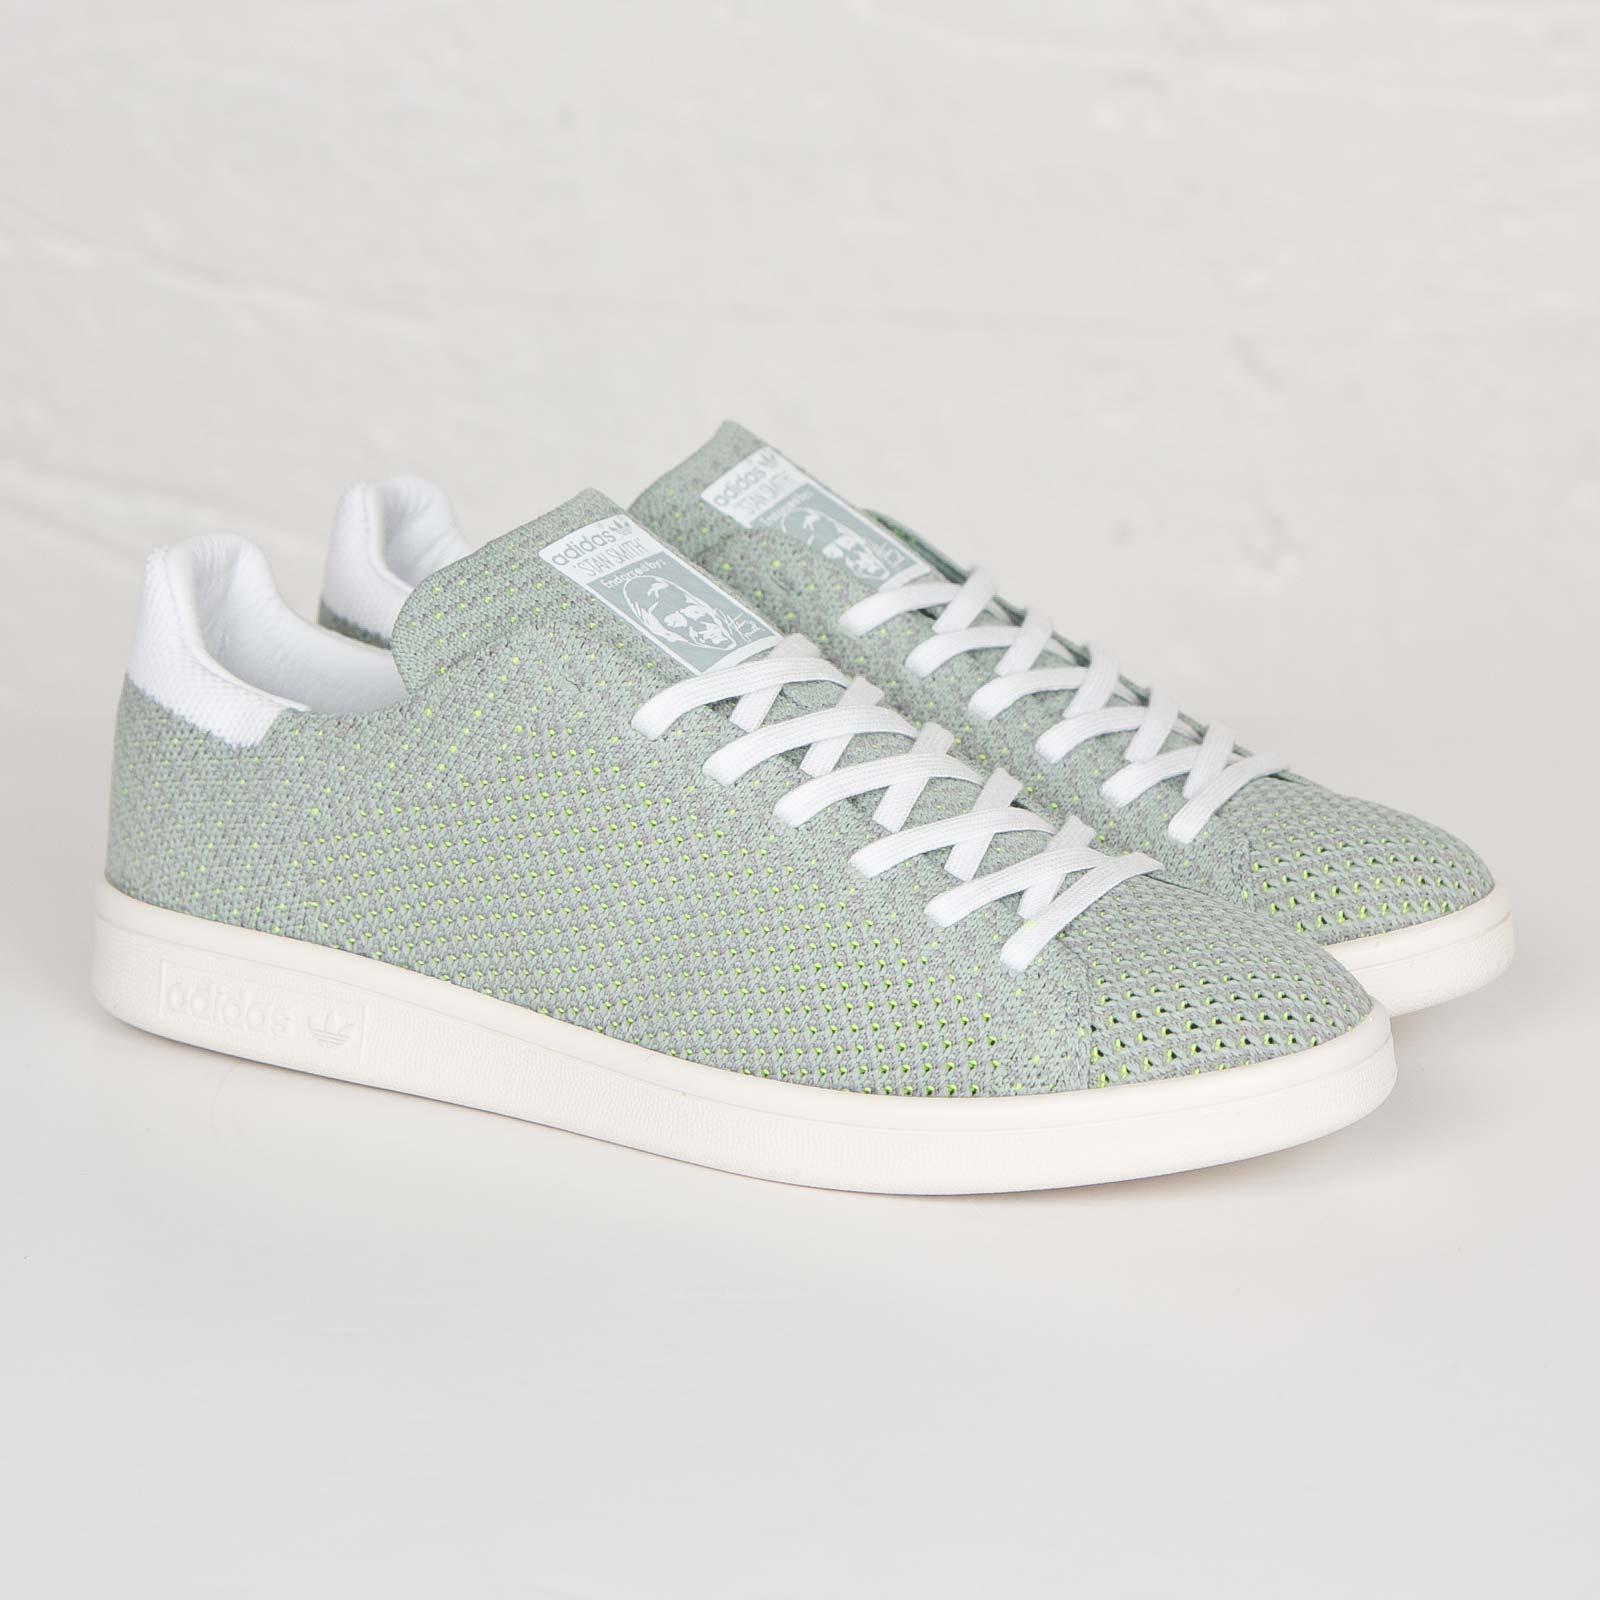 watch 73c46 ba740 adidas Stan Smith - Primeknit - S82634 - Sneakersnstuff ...